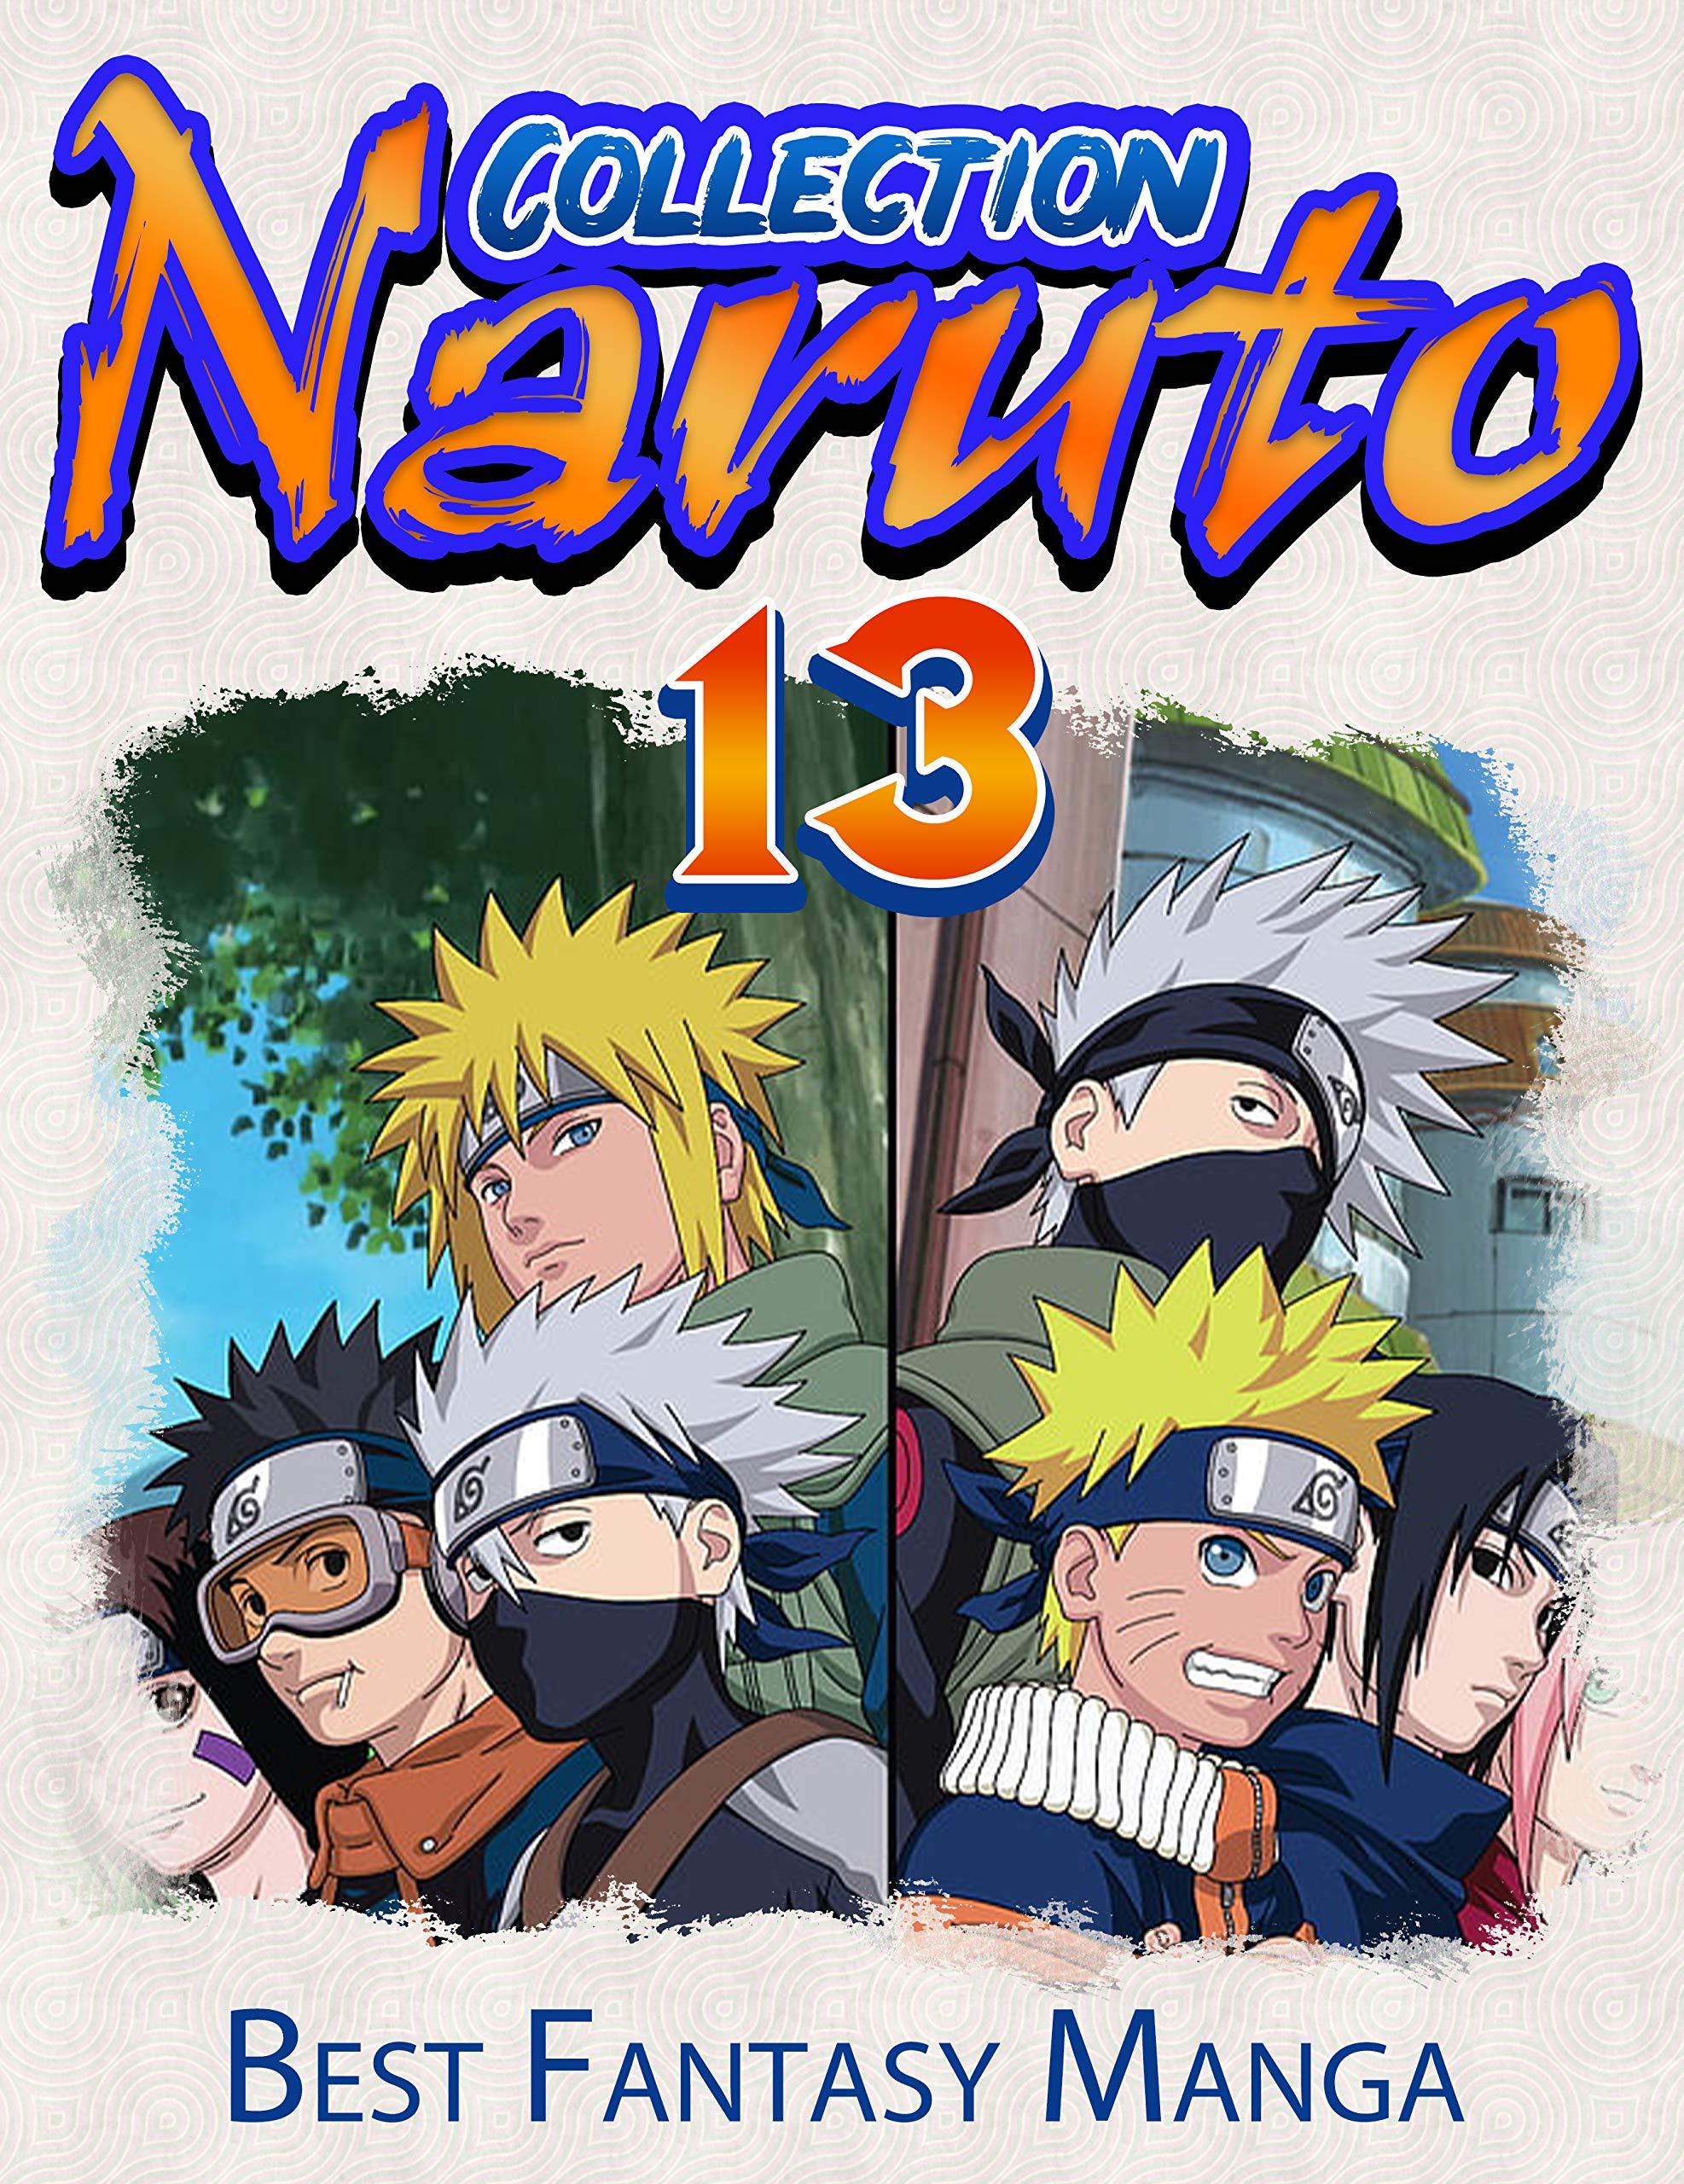 Best Fantasy Manga Naruto Collection: Full Collection Naruto Vol 13